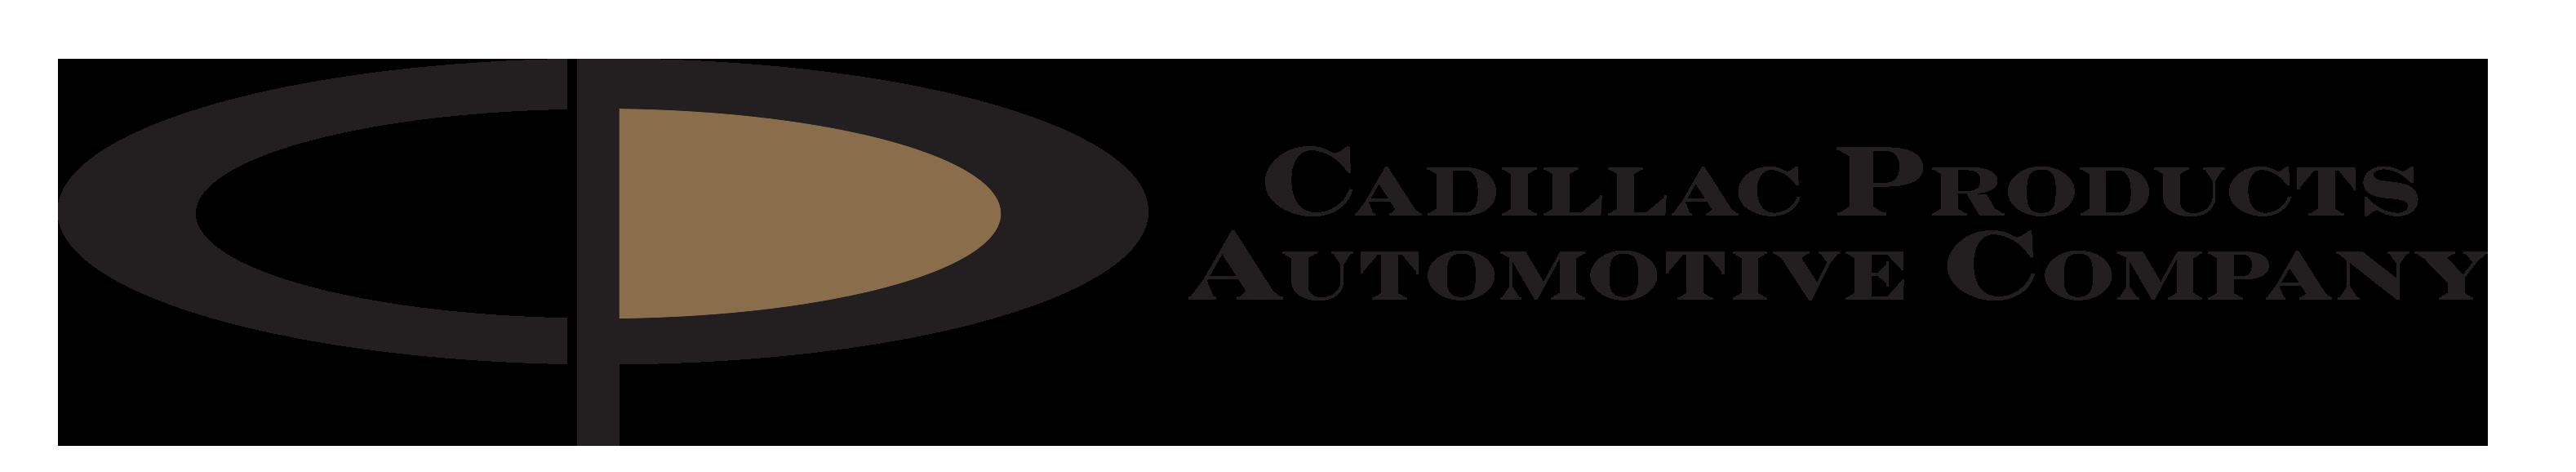 Cadillac Products Automotive Company